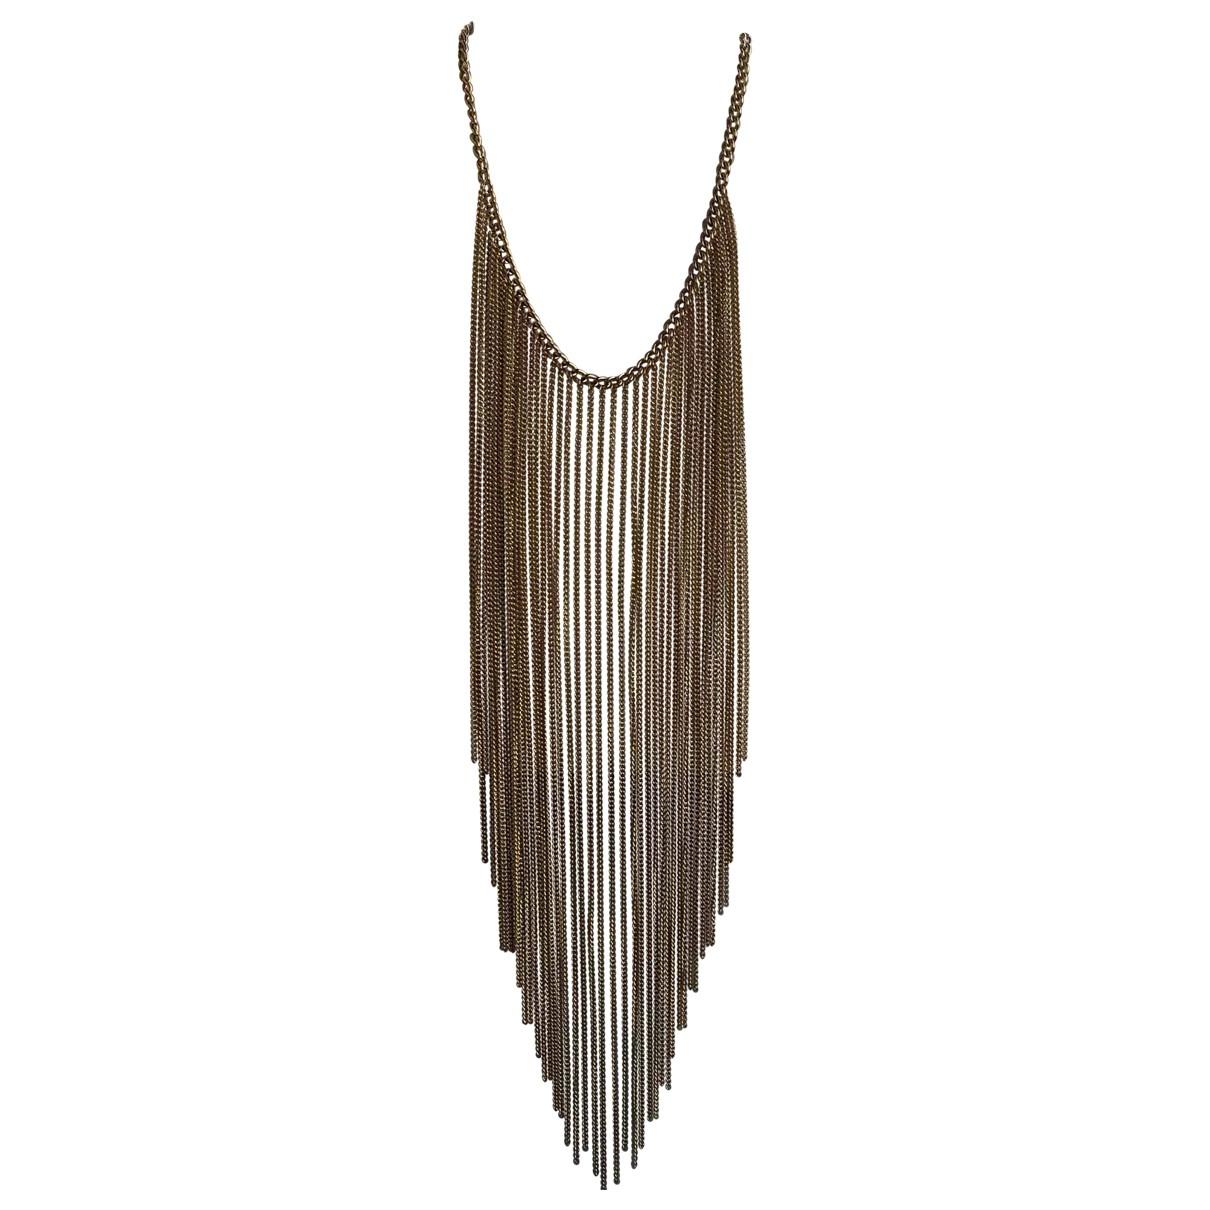 Michael Kors \N Gold Steel necklace for Women \N